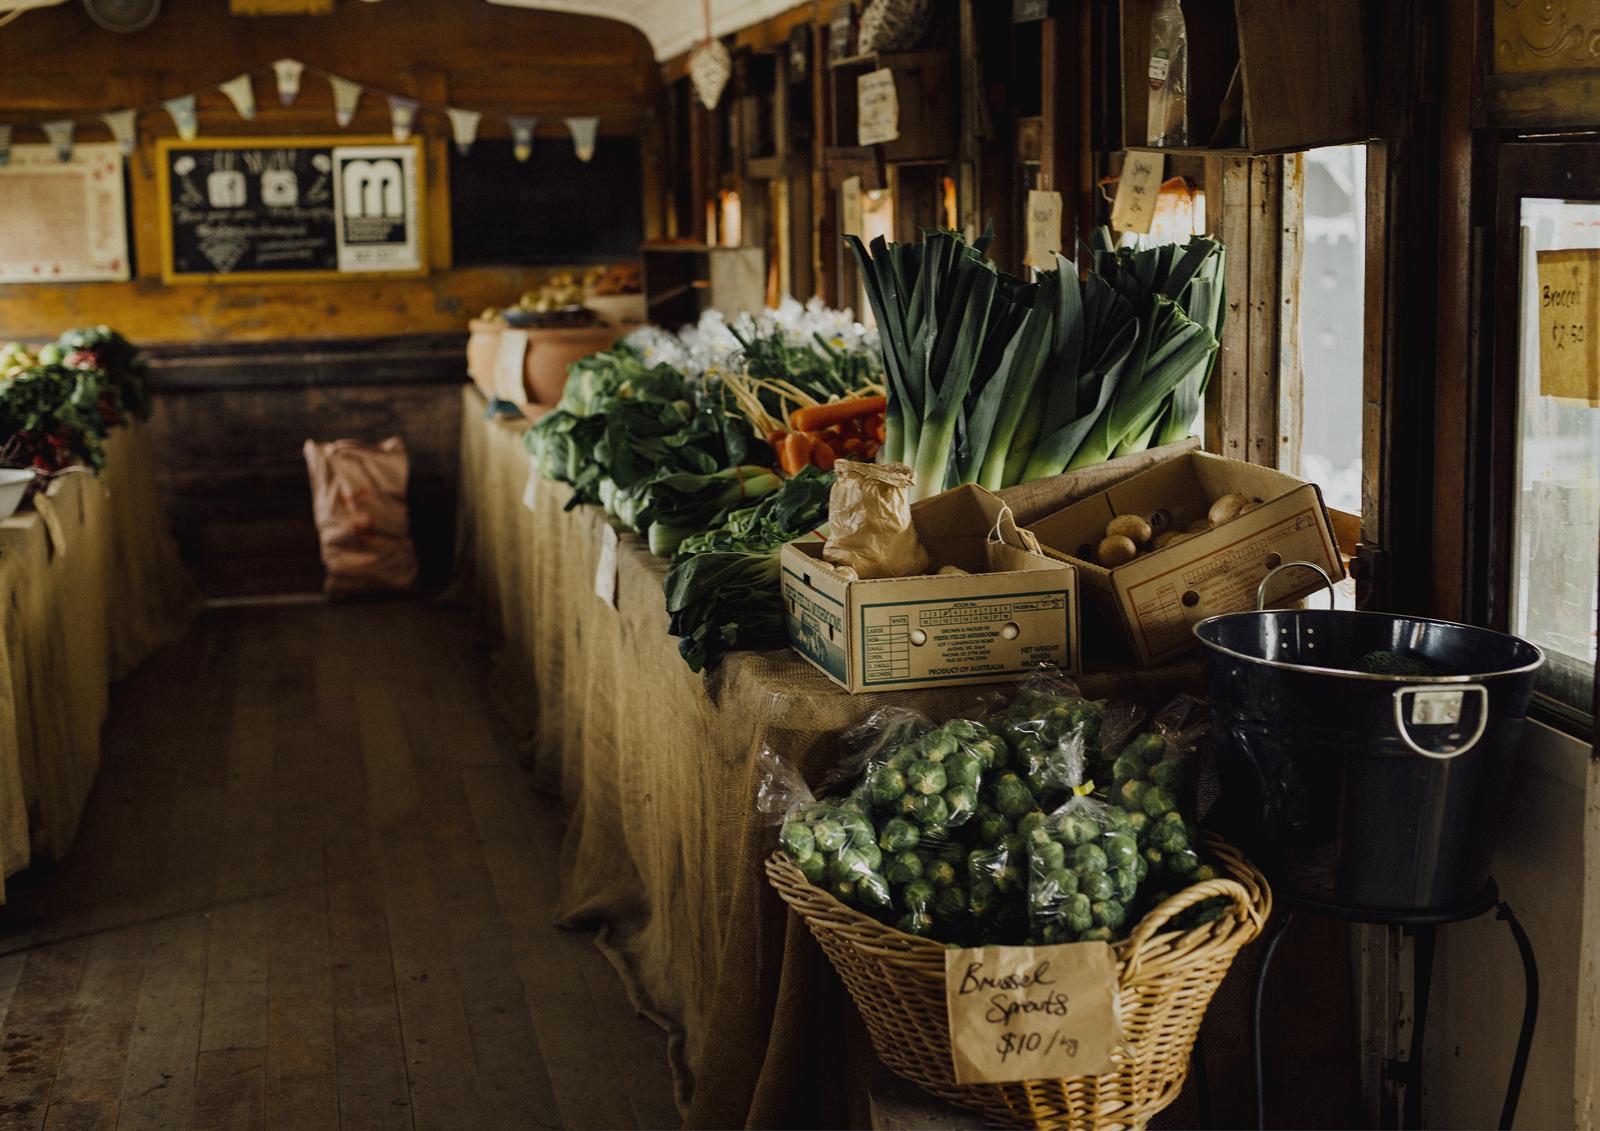 Benton Rise Farm fresh produce